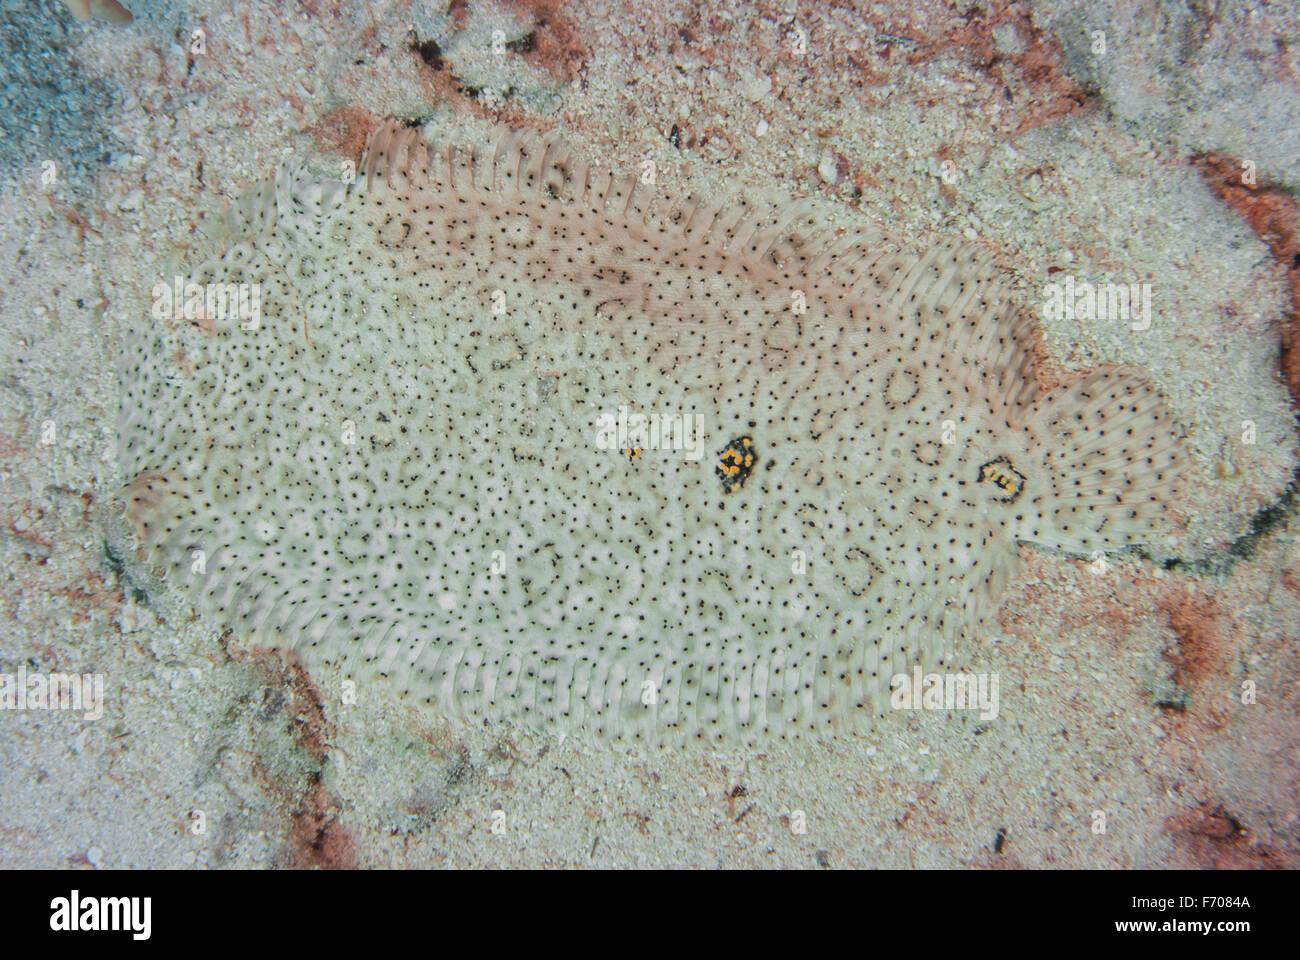 Mosè suola, Padachirus marmoratus, Soleidi, Sharm el Sheikh, Mar Rosso, Egitto Immagini Stock